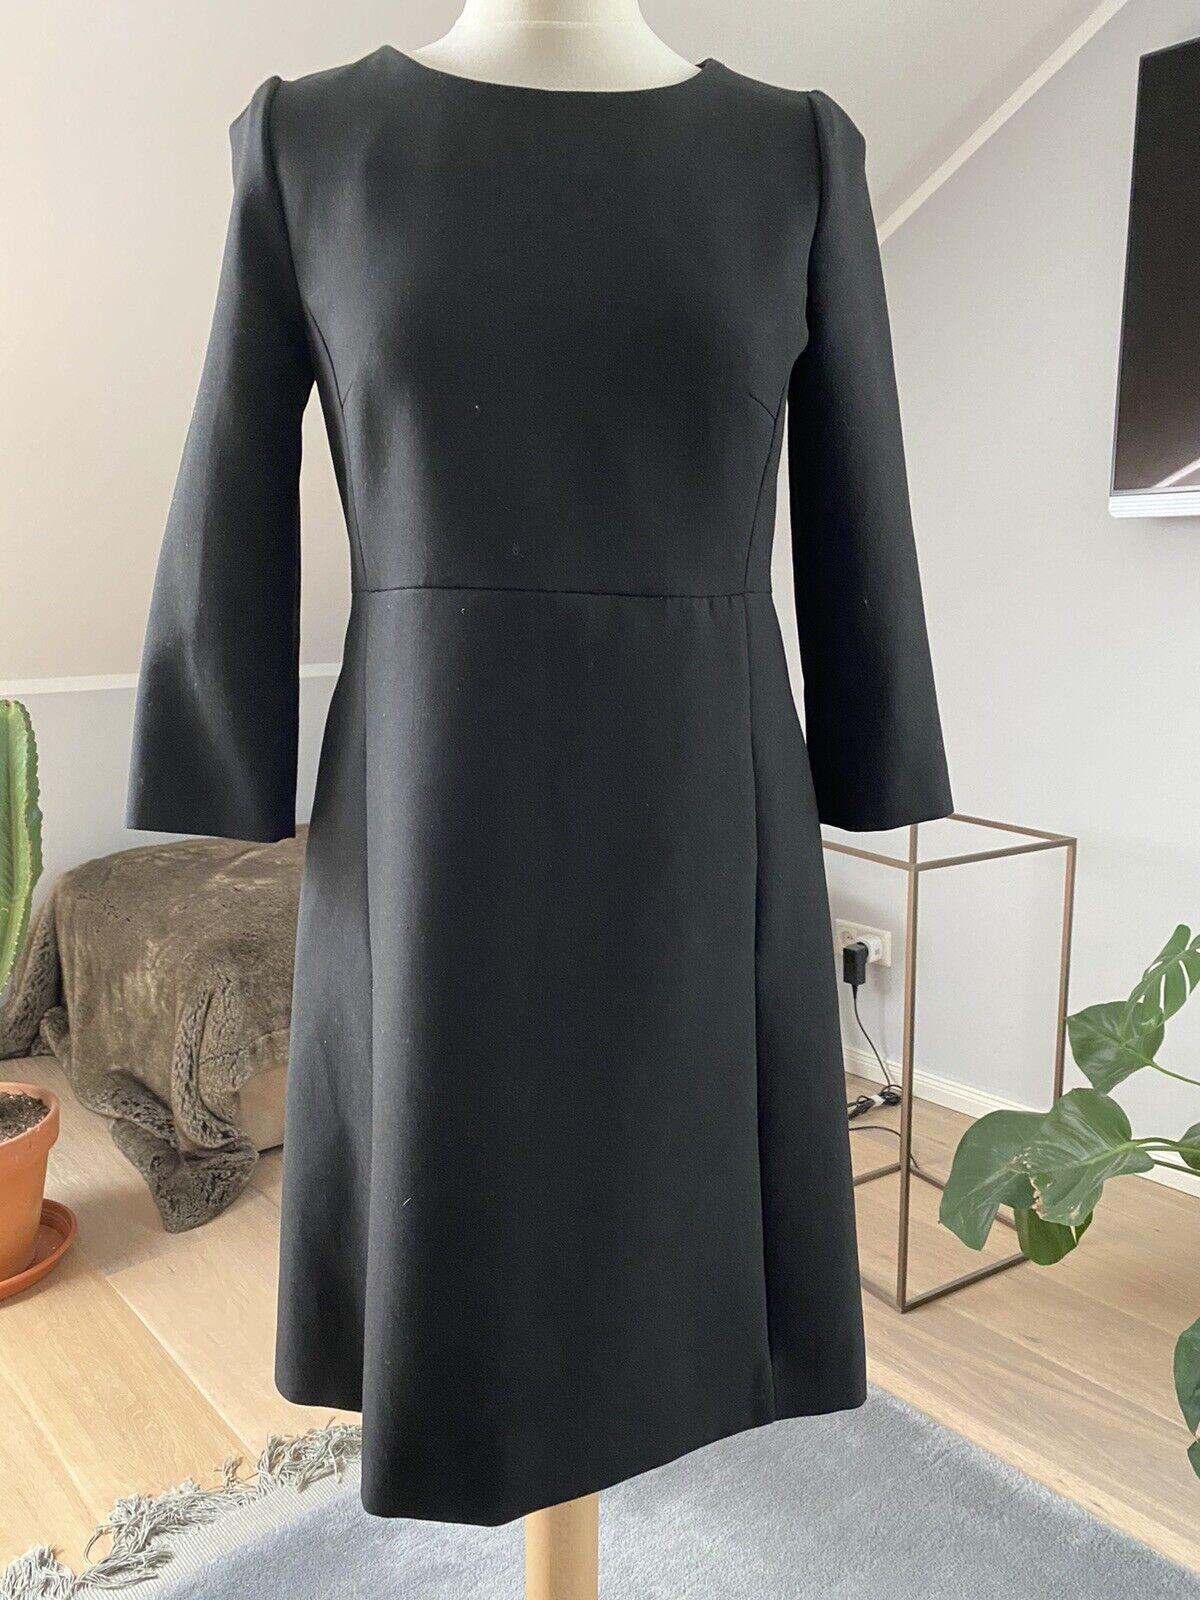 Dress, Black Size 38, Hallhuber